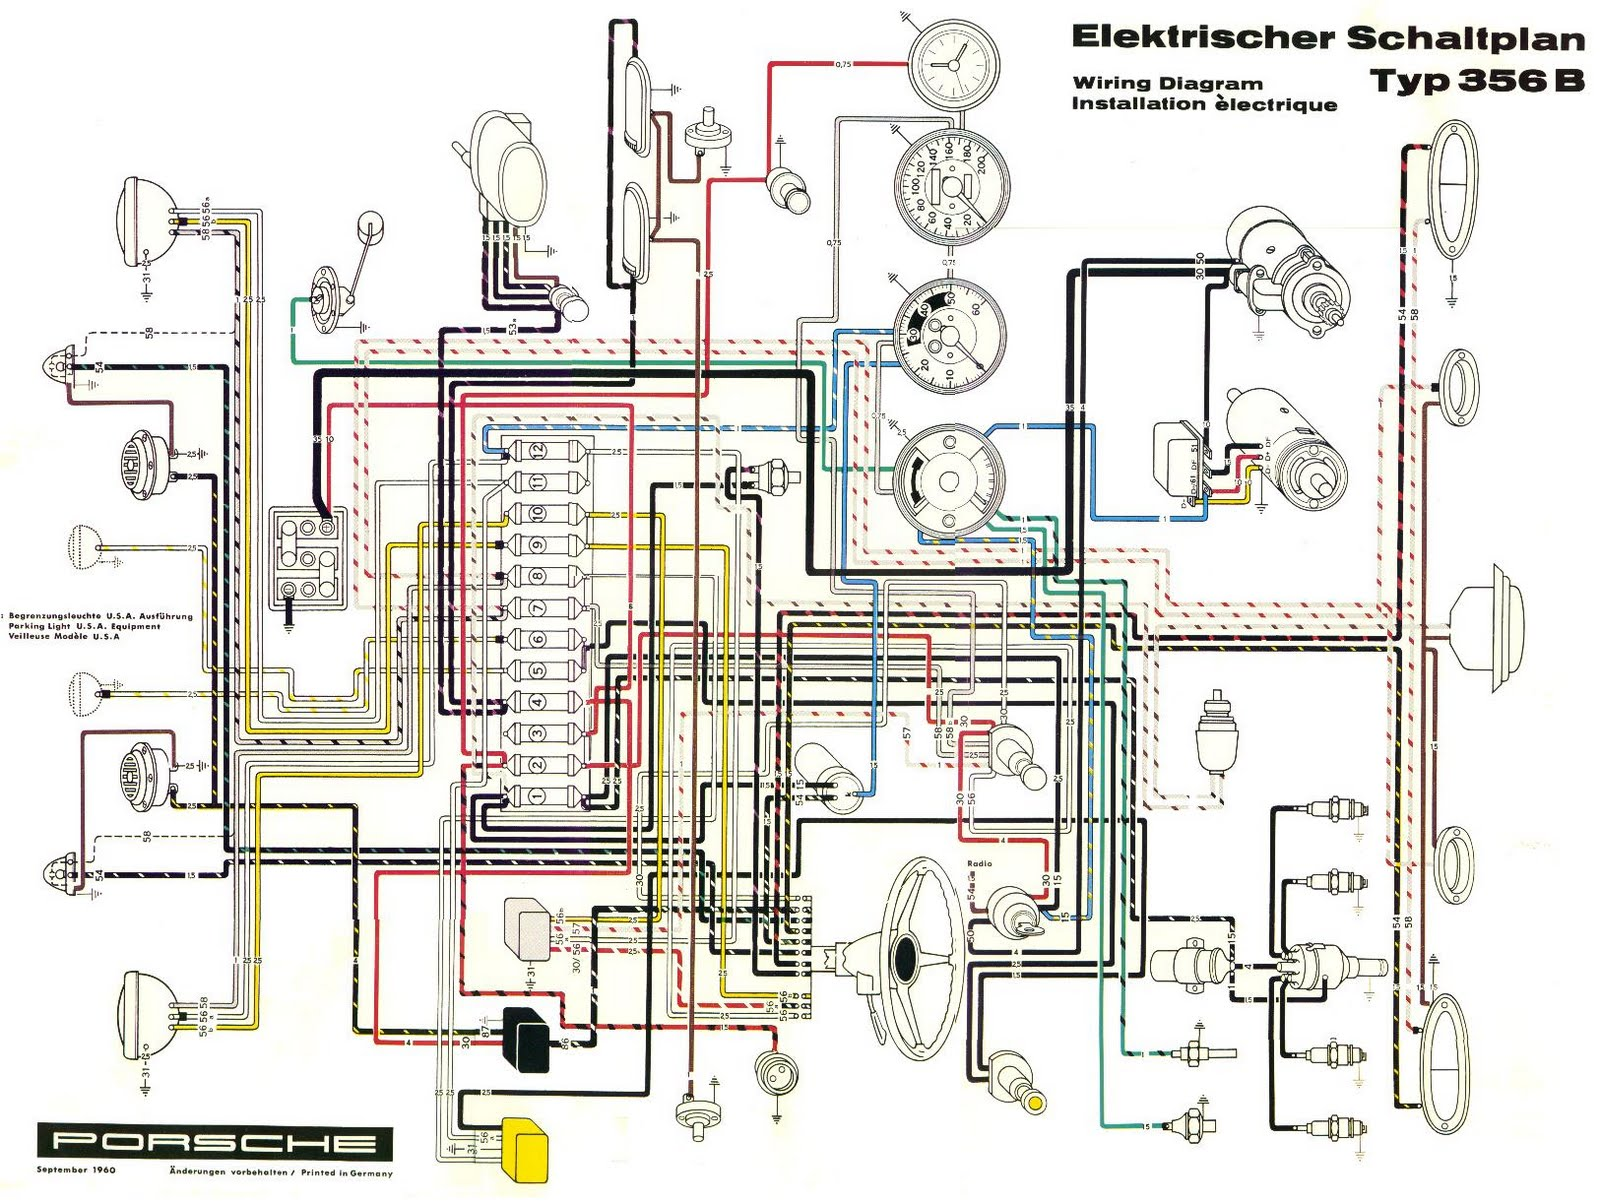 1987 Porsche 924s Ignition Wiring Diagram | Repair Manual